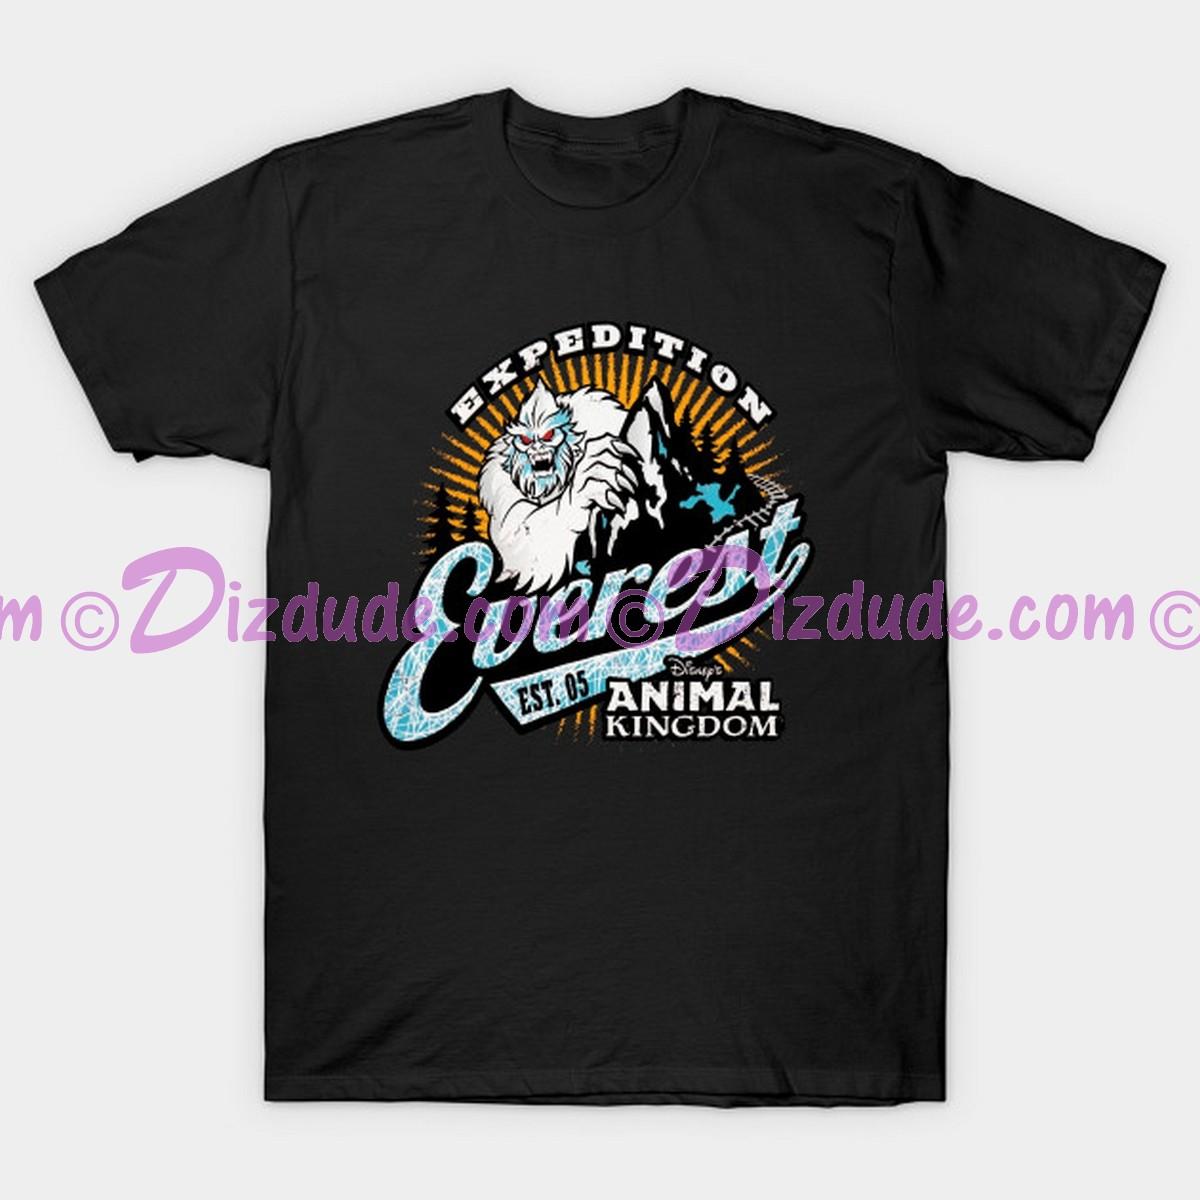 Yeti Logo Adult T-Shirt (Tee, Tshirt or T shirt) ~ Expedition Everest